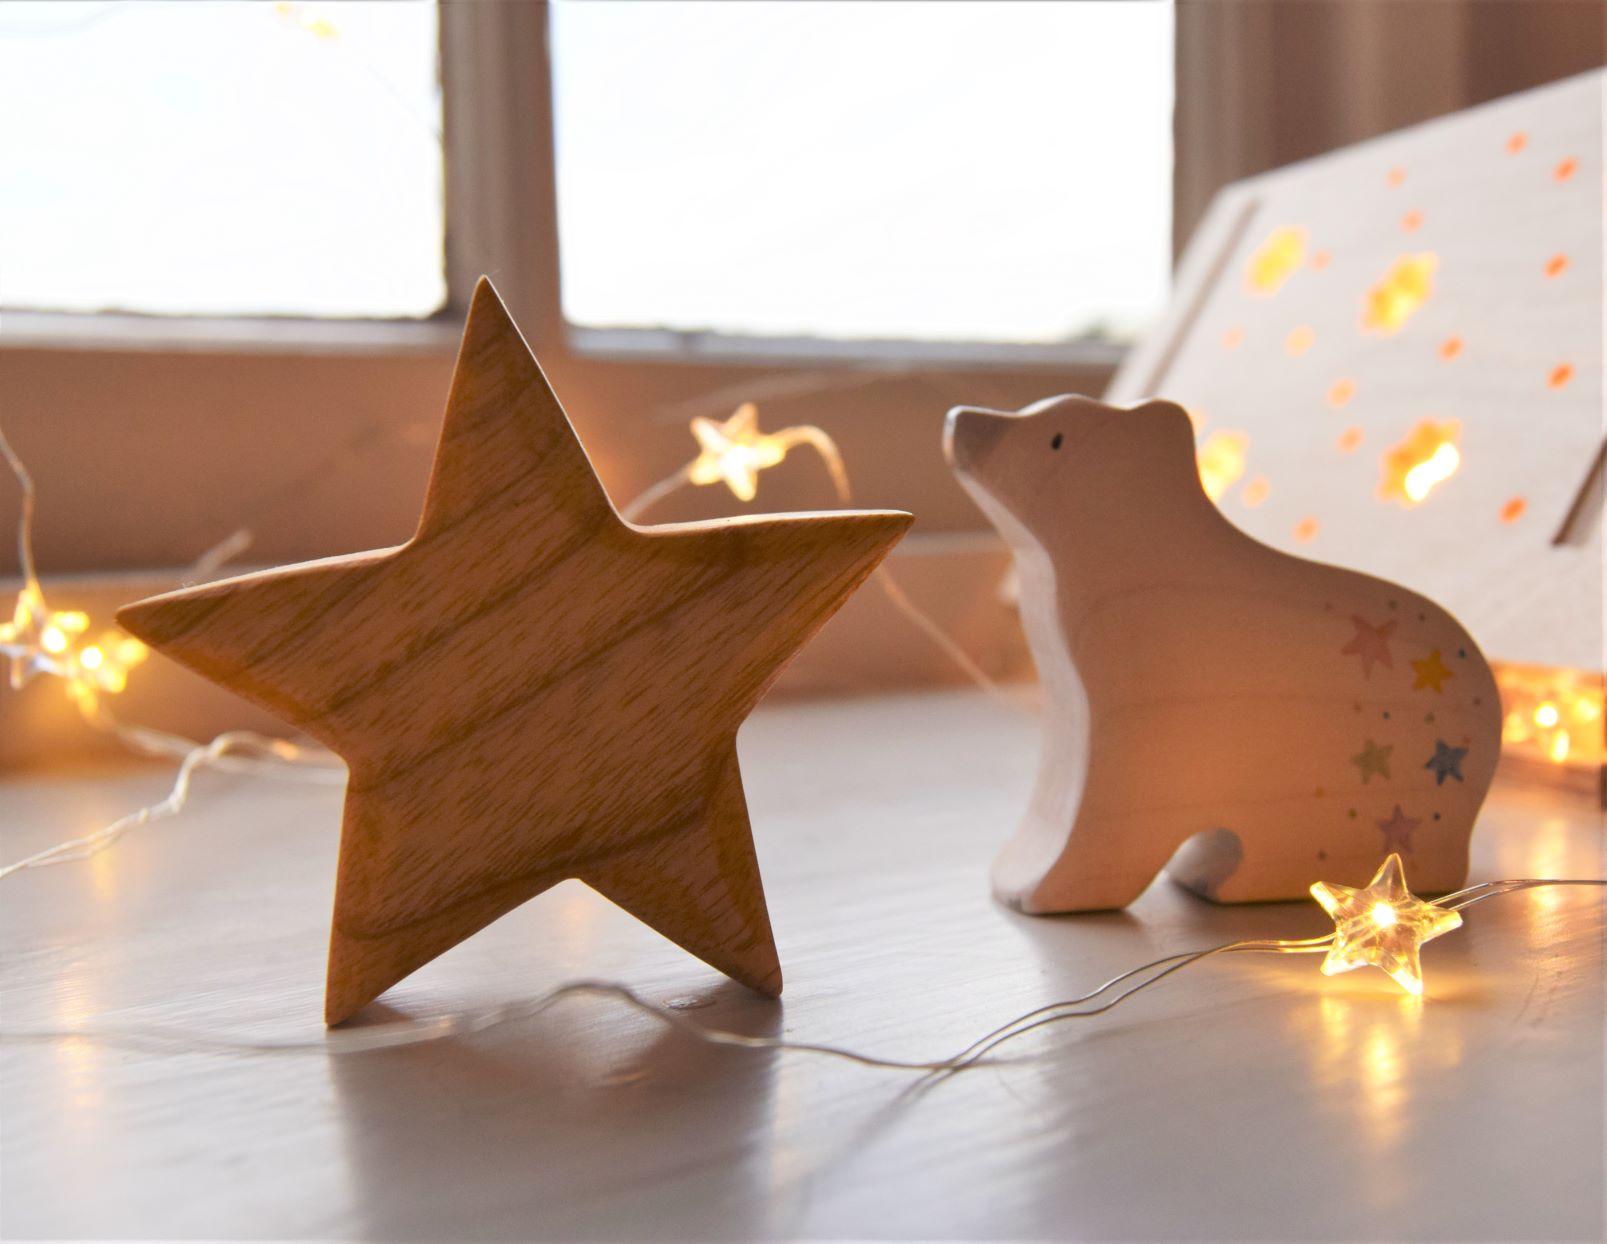 1611674181_gold_star_-_reach_for_the_stars_(2).jpg